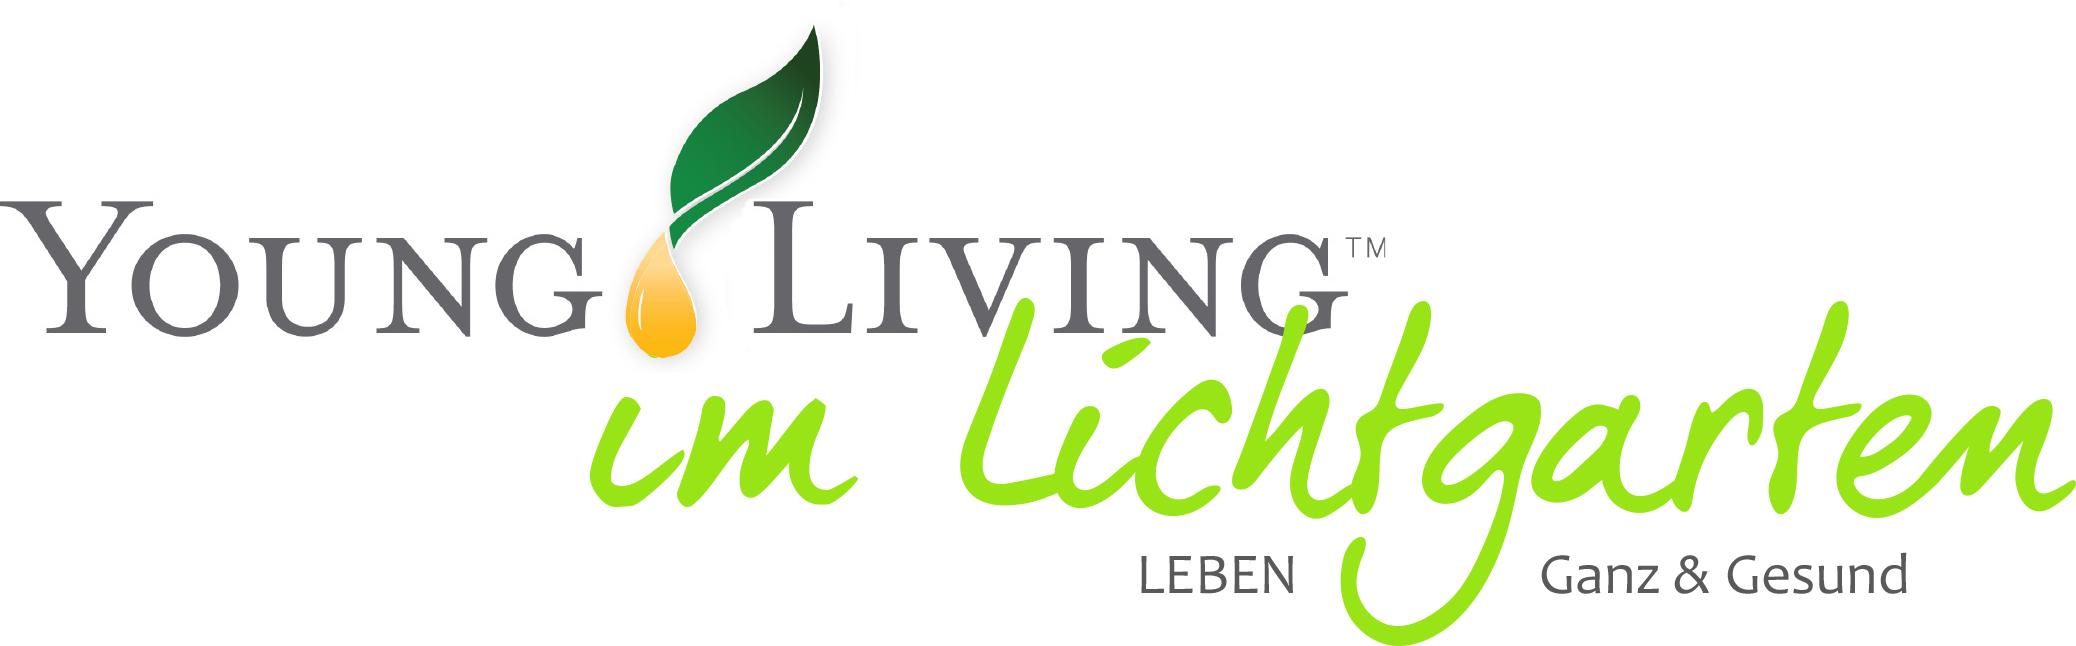 Kopf YL -Lichtgarten